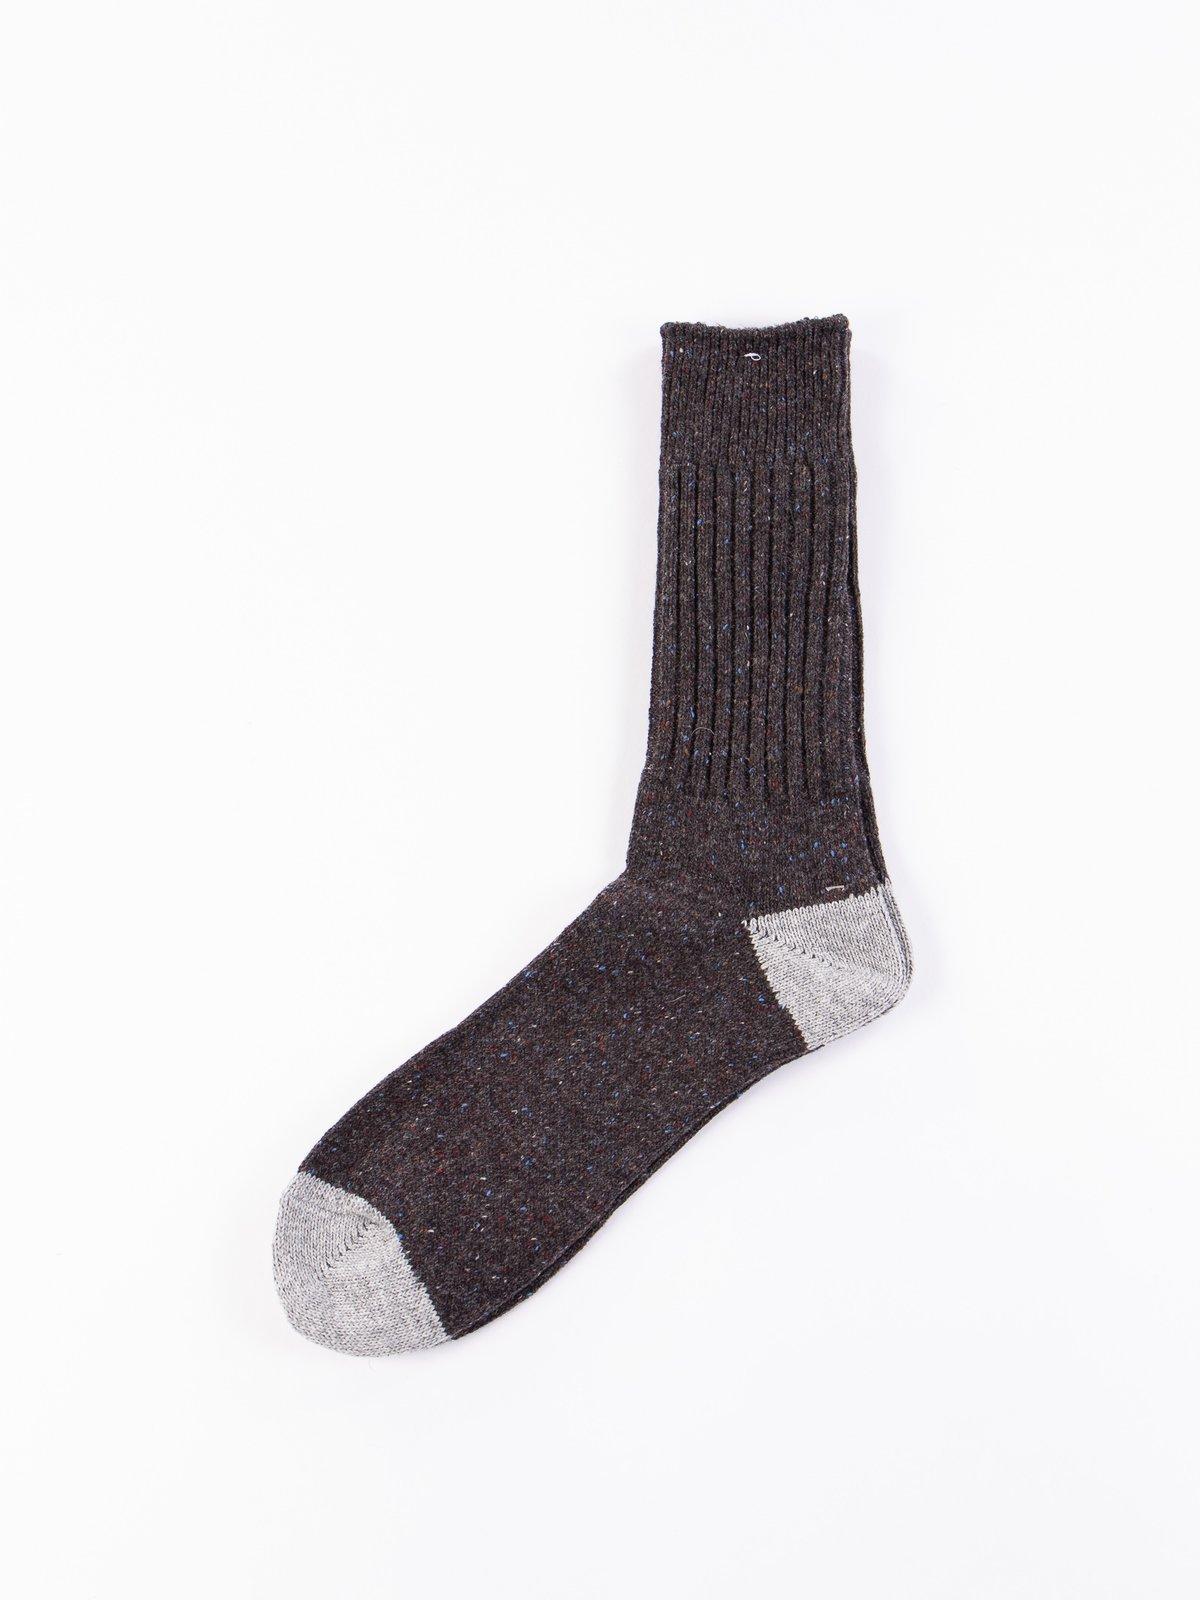 Charcoal Nep Yarn Crew Socks - Image 1